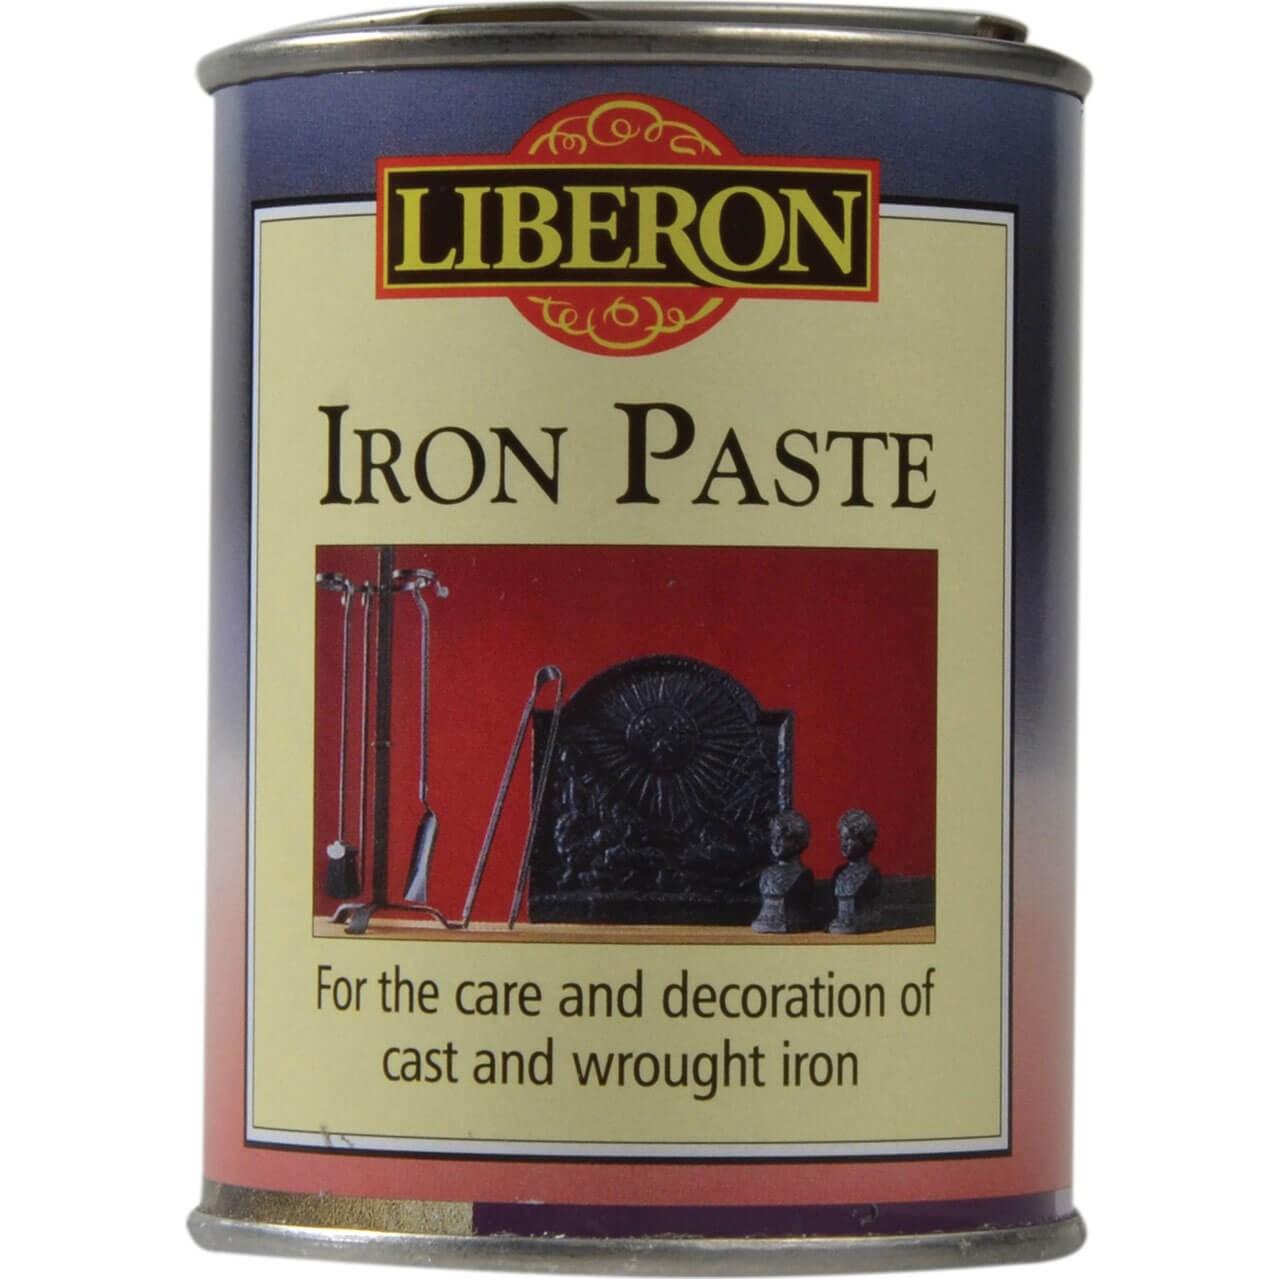 Liberon Iron Paste Metal Care